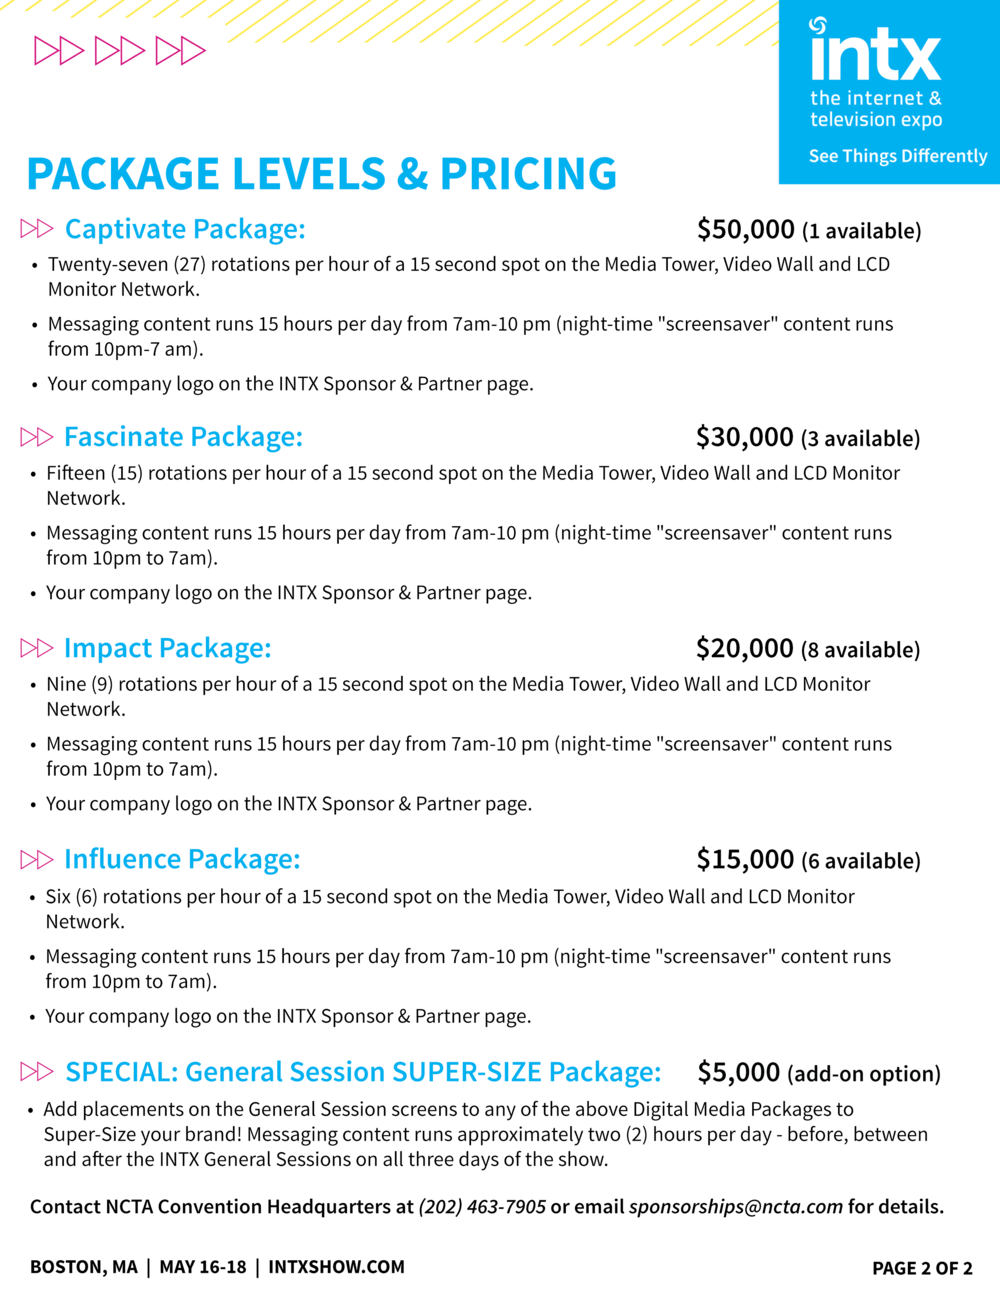 INTX 2016 Digital Media Sponsorship Brochure 2 Page Promotional Flyer